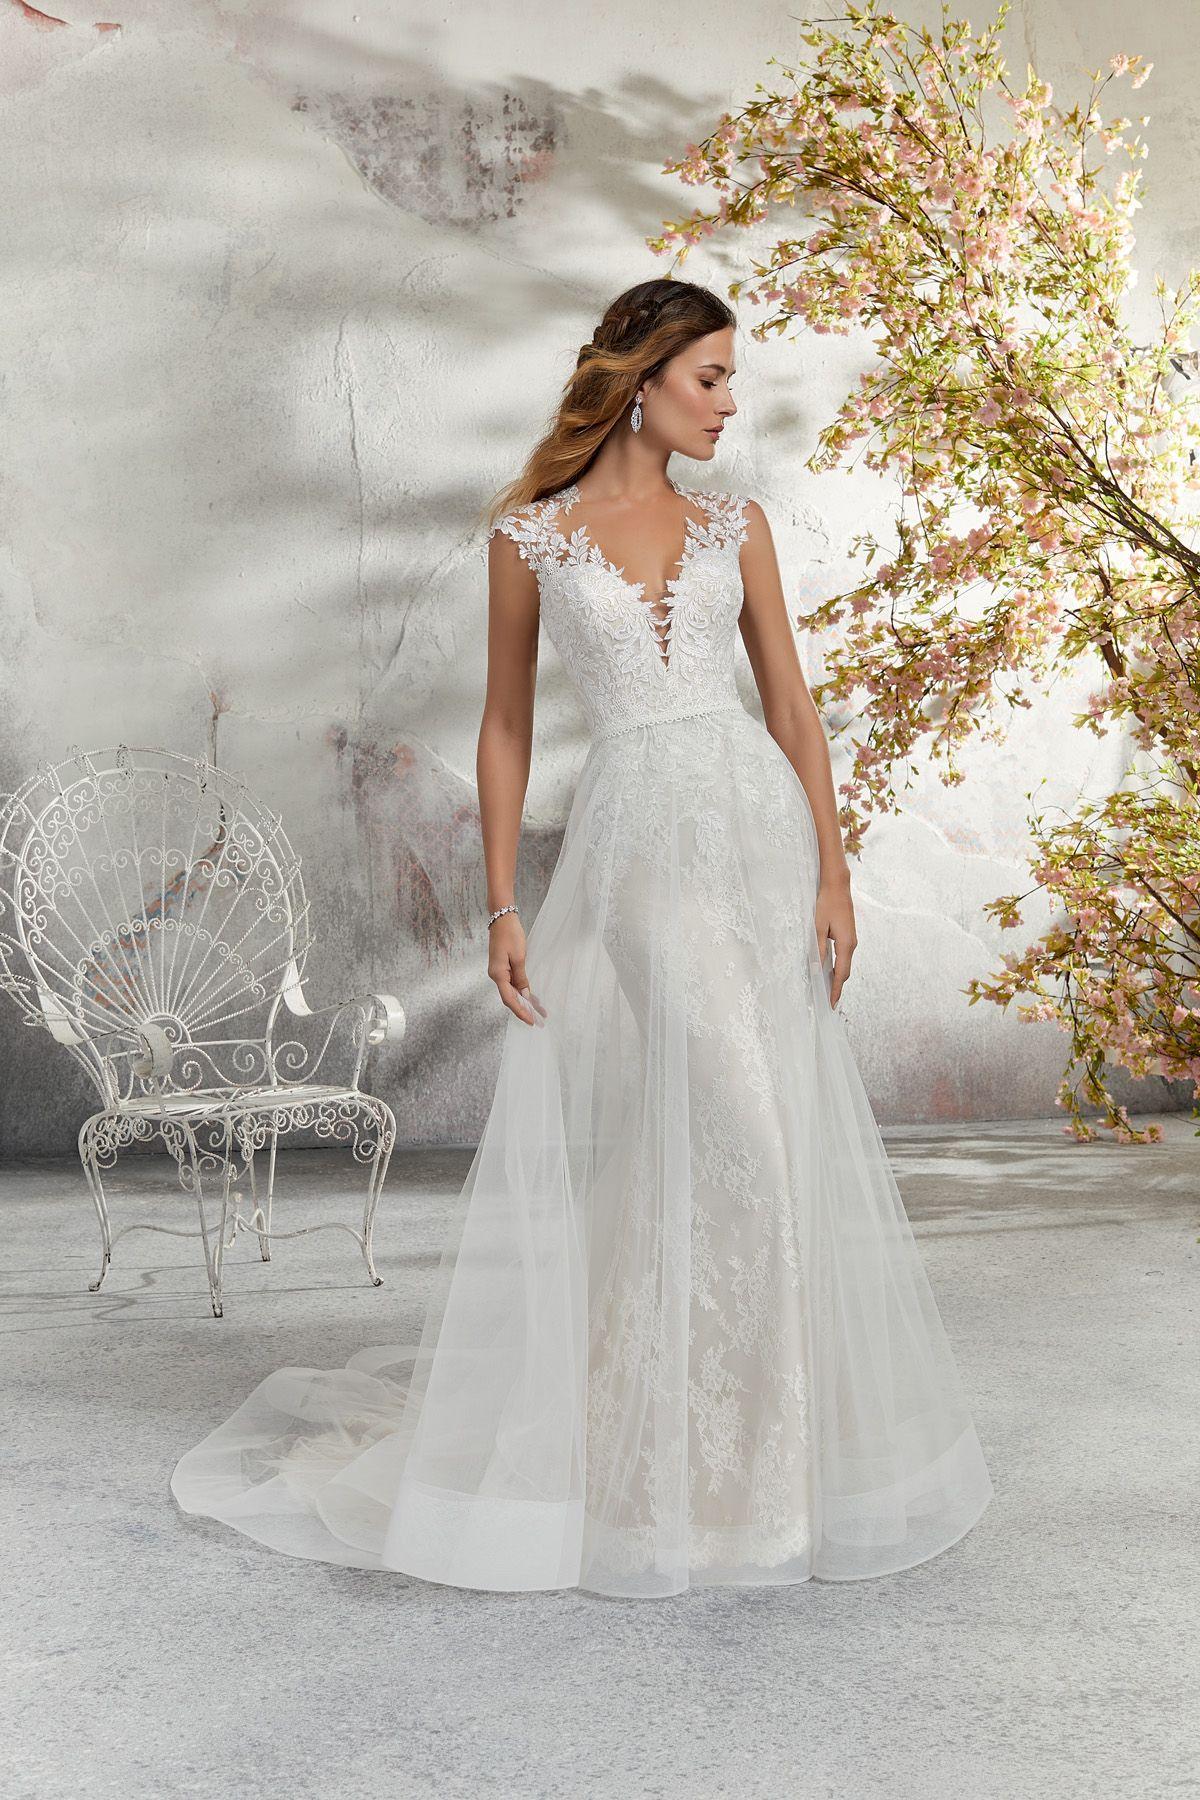 Mori Lee Wedding Dresses In Sydney Mori Lee Wedding Dress Wedding Dresses Casual Wedding Dress